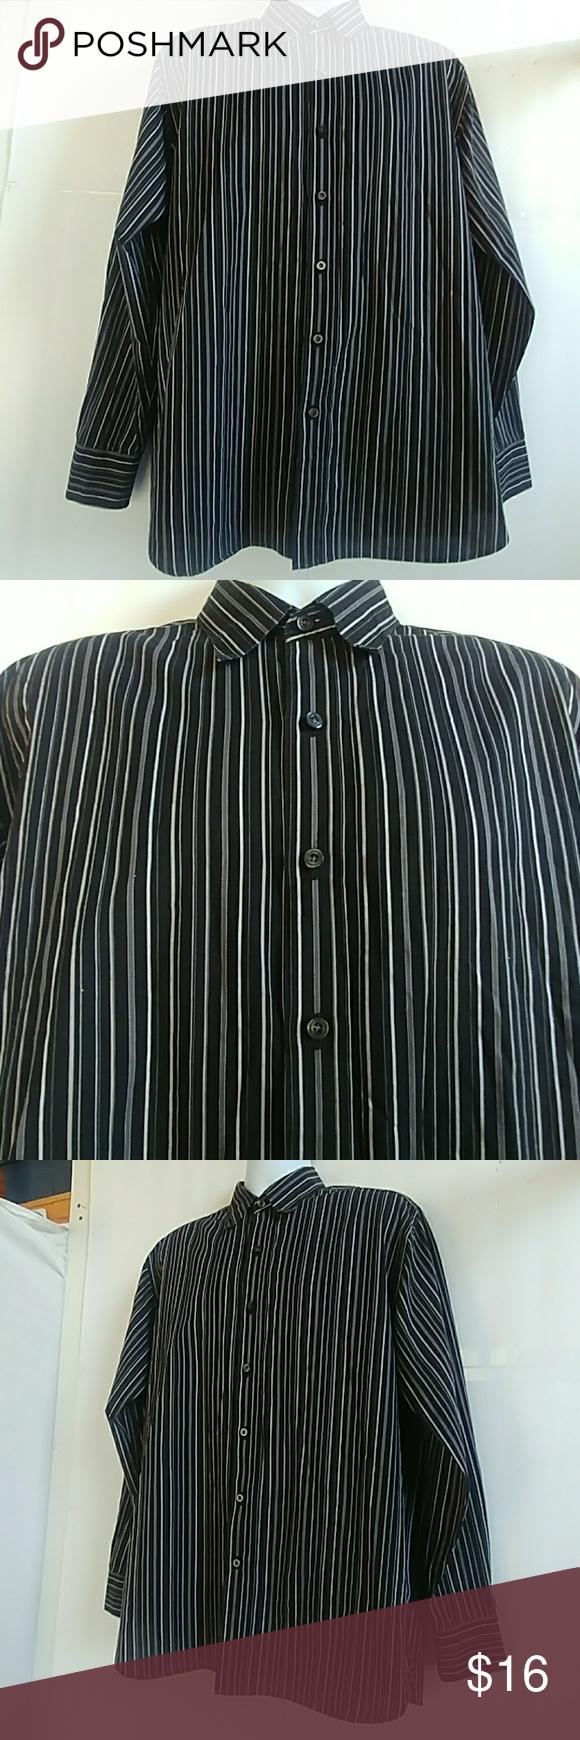 Sale Austin Reed Men S Pinstripe Dress Shirt Pinstripe Dress Pinstripe Shirt Dress